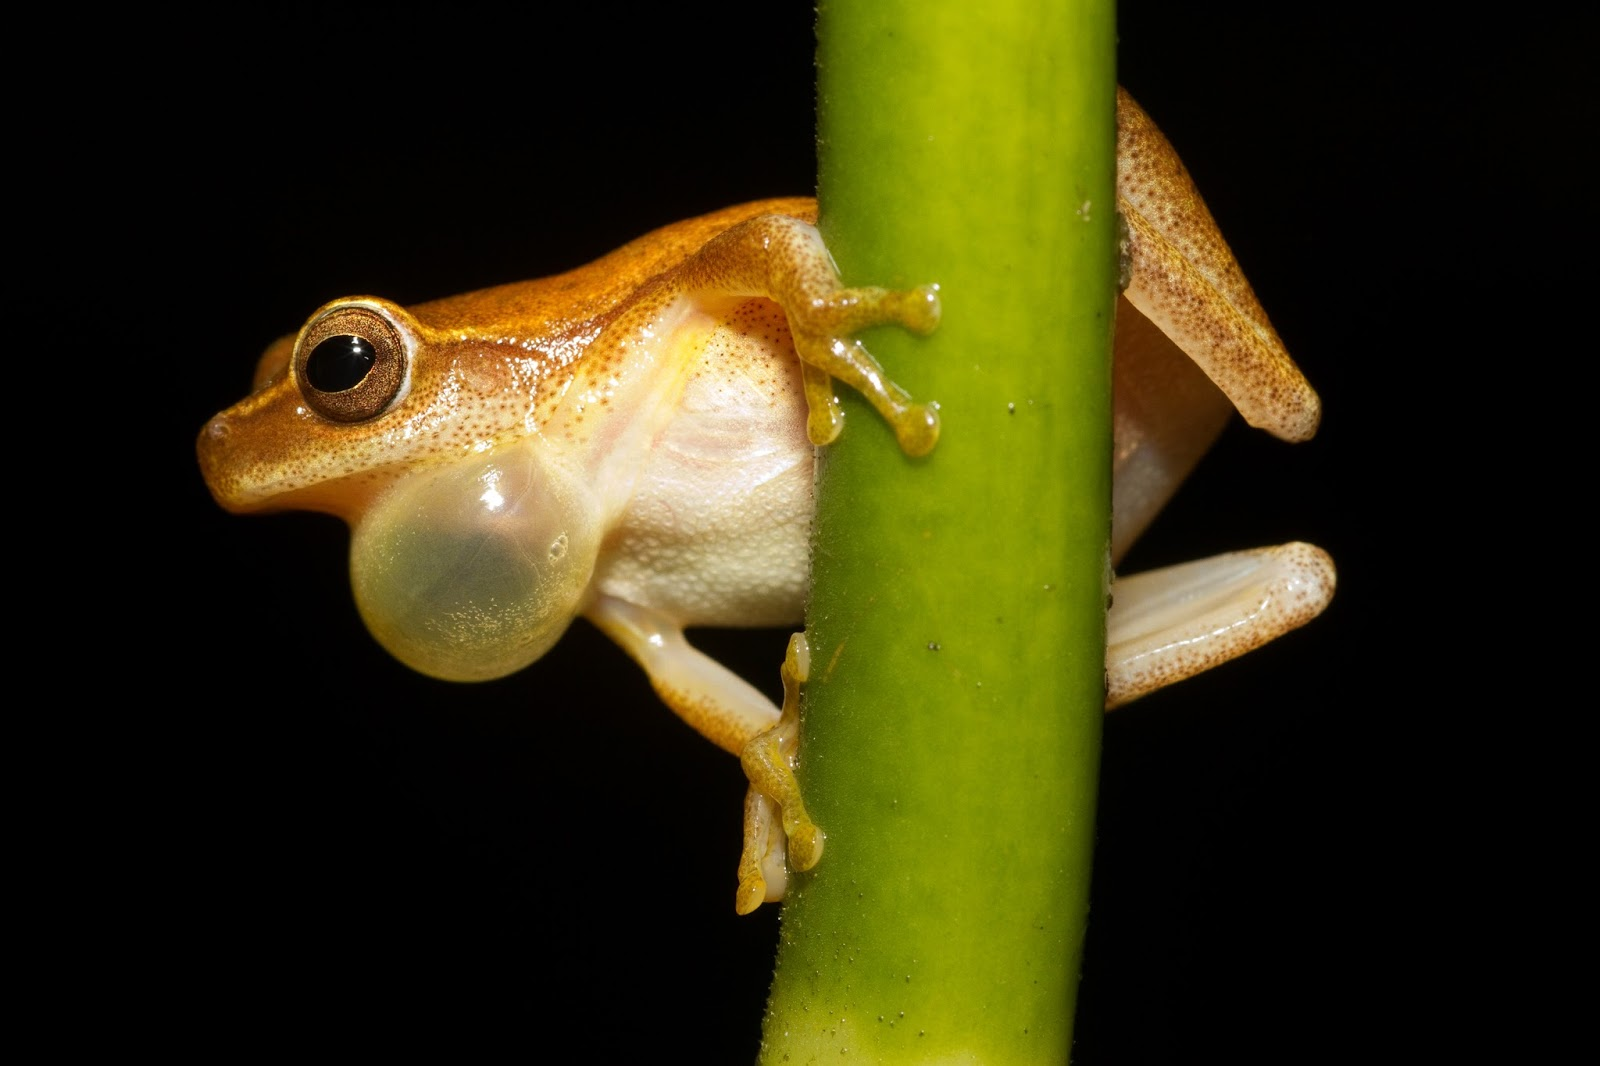 Amphibians: Dendropsophus microcephalus - calling male